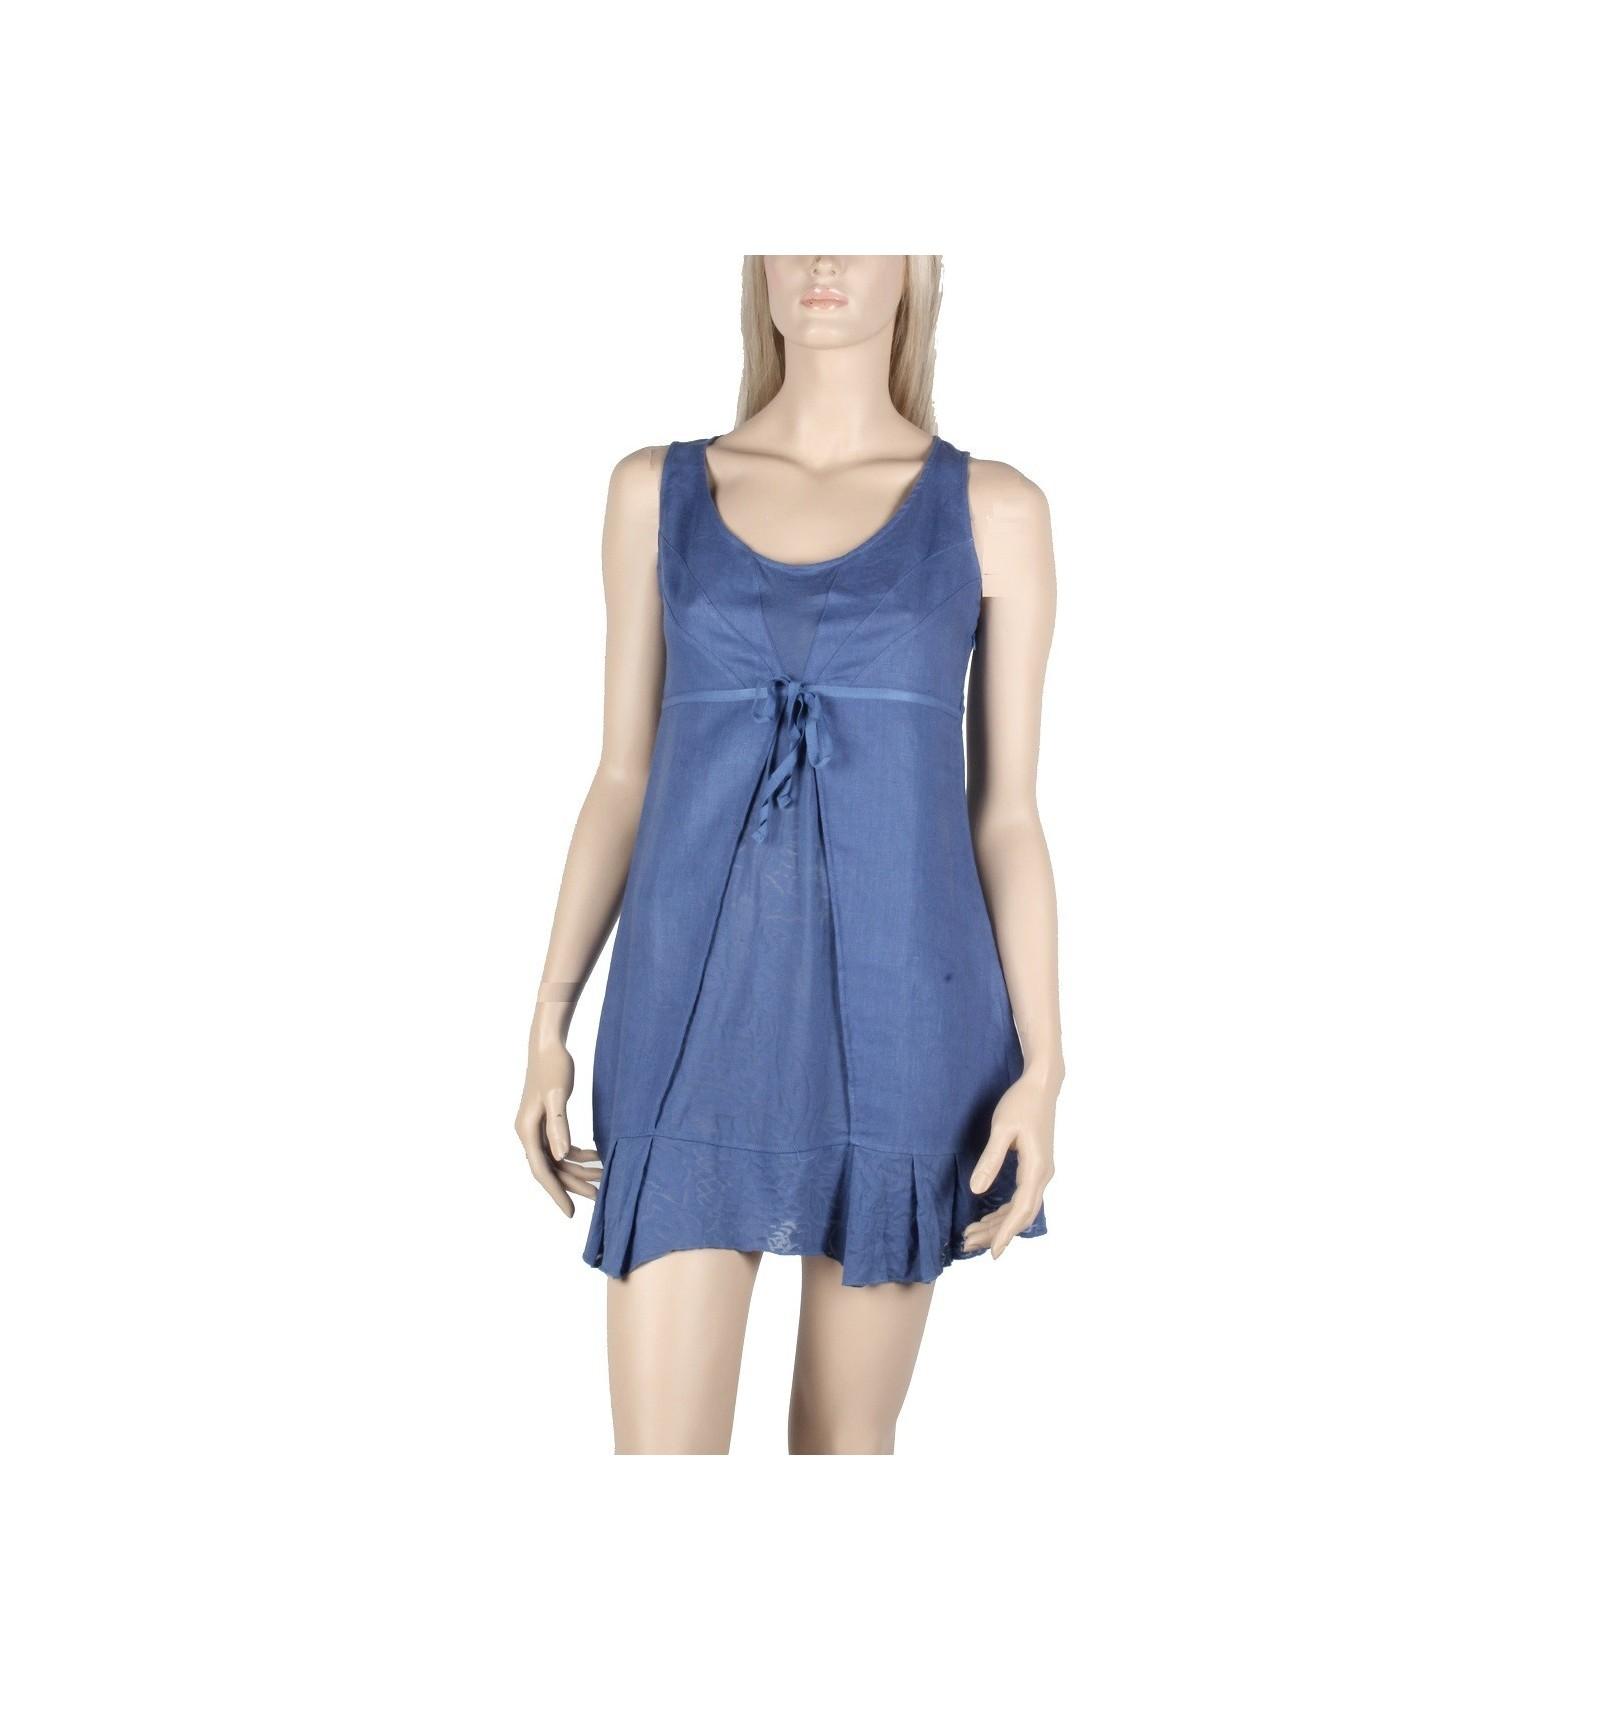 bdeac521dd4 Tunique Femme en Lin et Cotton couleur bleu - Robe Maloka - Mode-Lin.com